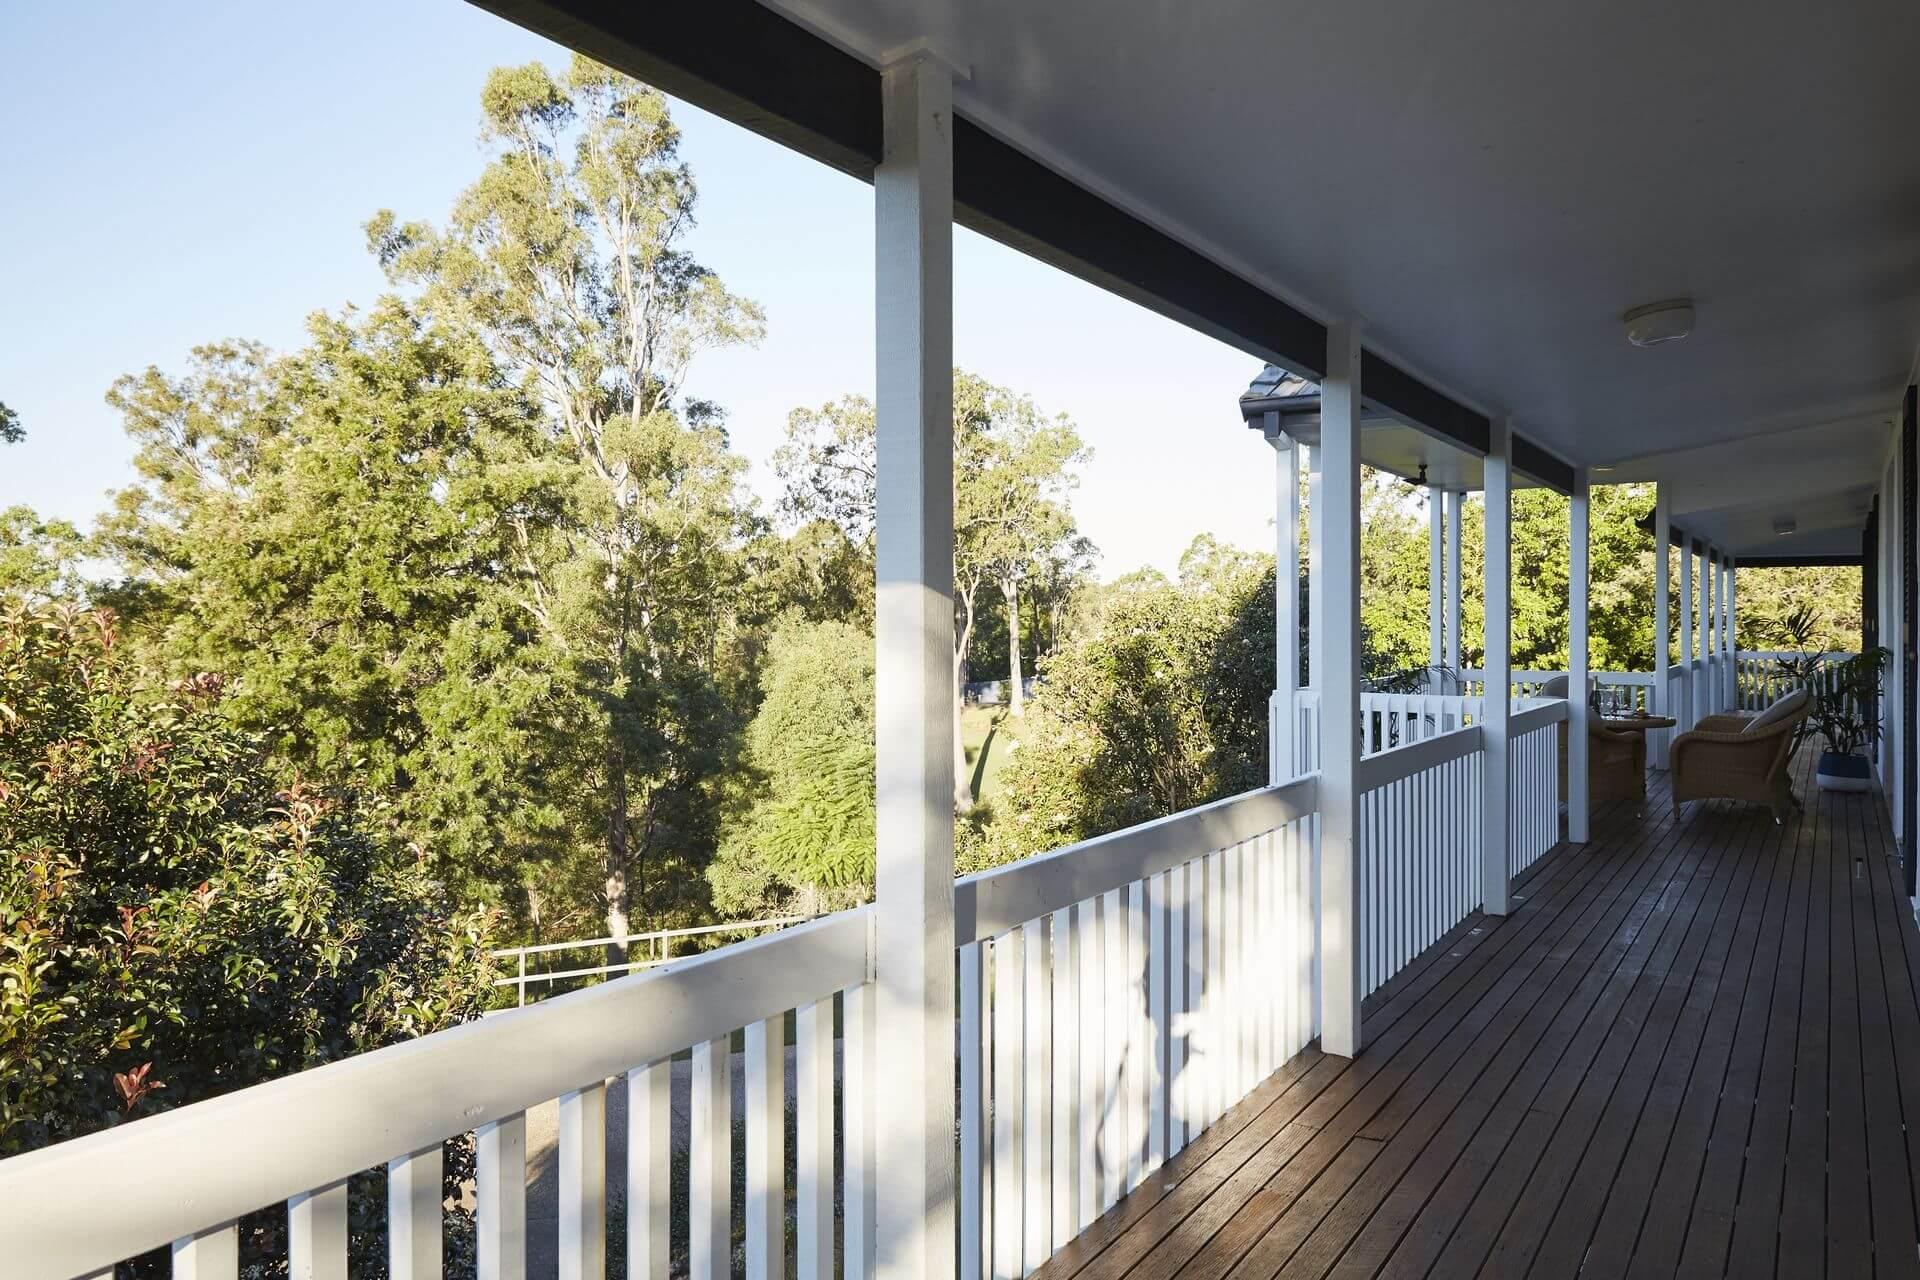 Upstiars veranda view